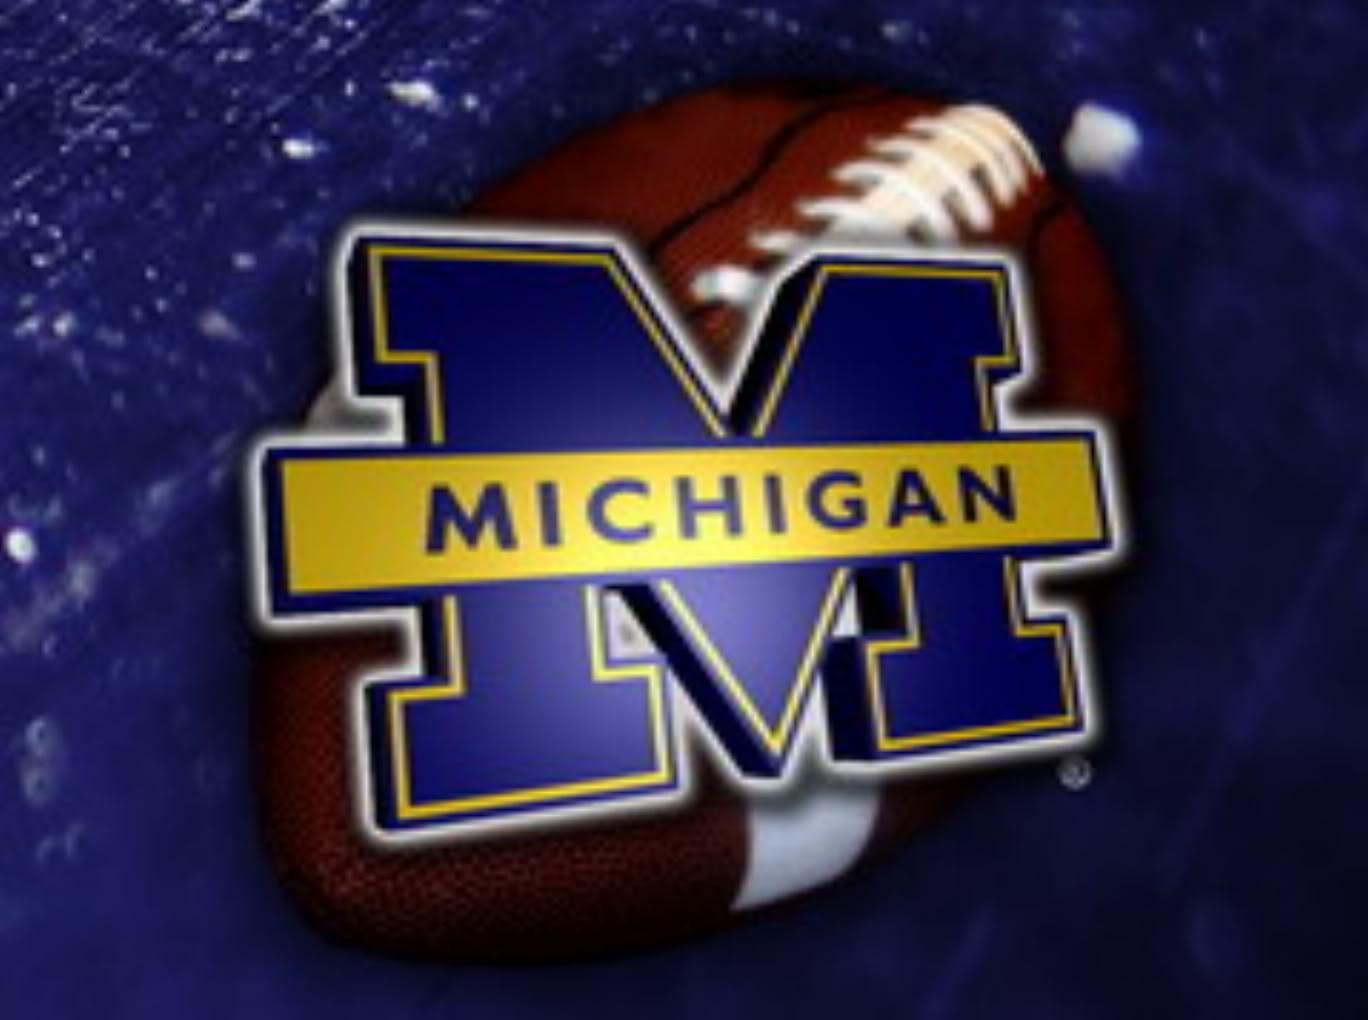 Michigan Wolverines Football Wallpapers: Michigan Football Wallpaper 2015